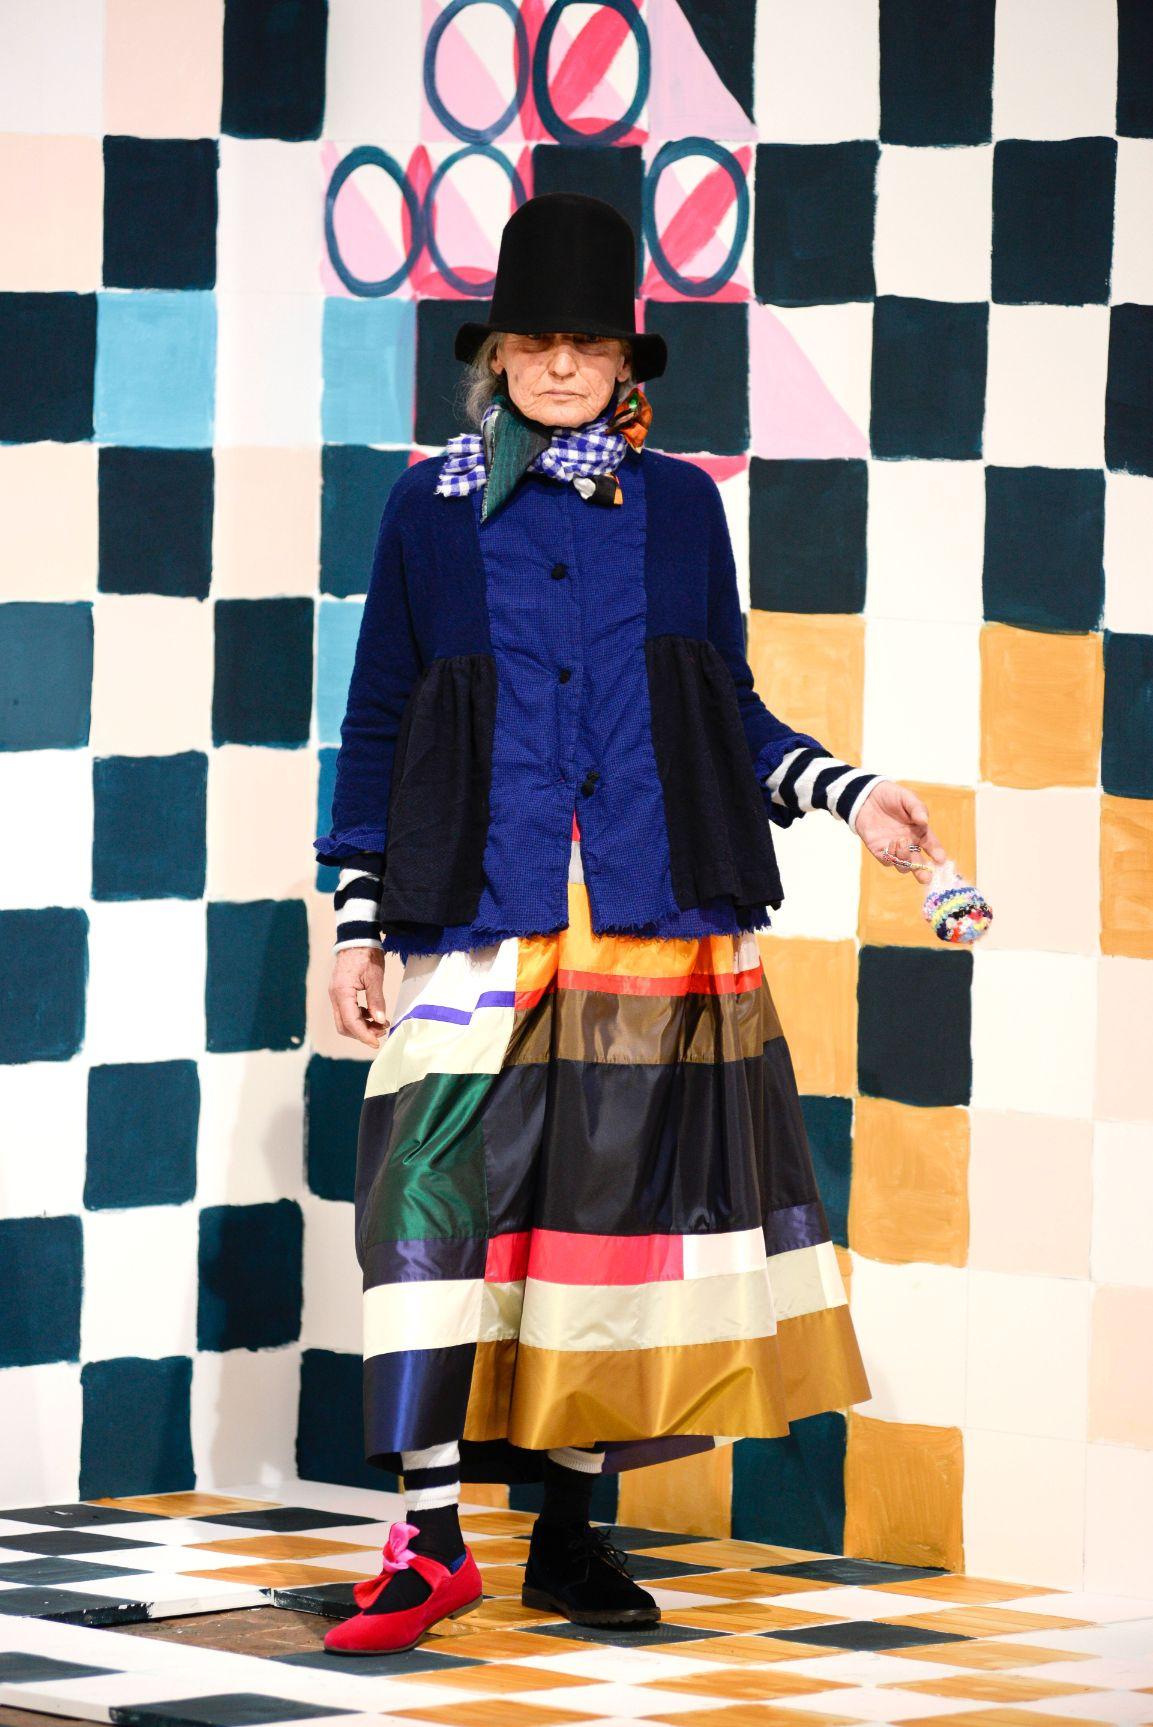 Milan Fashion Week: Daniela Gregis autumn winter 2022 collection